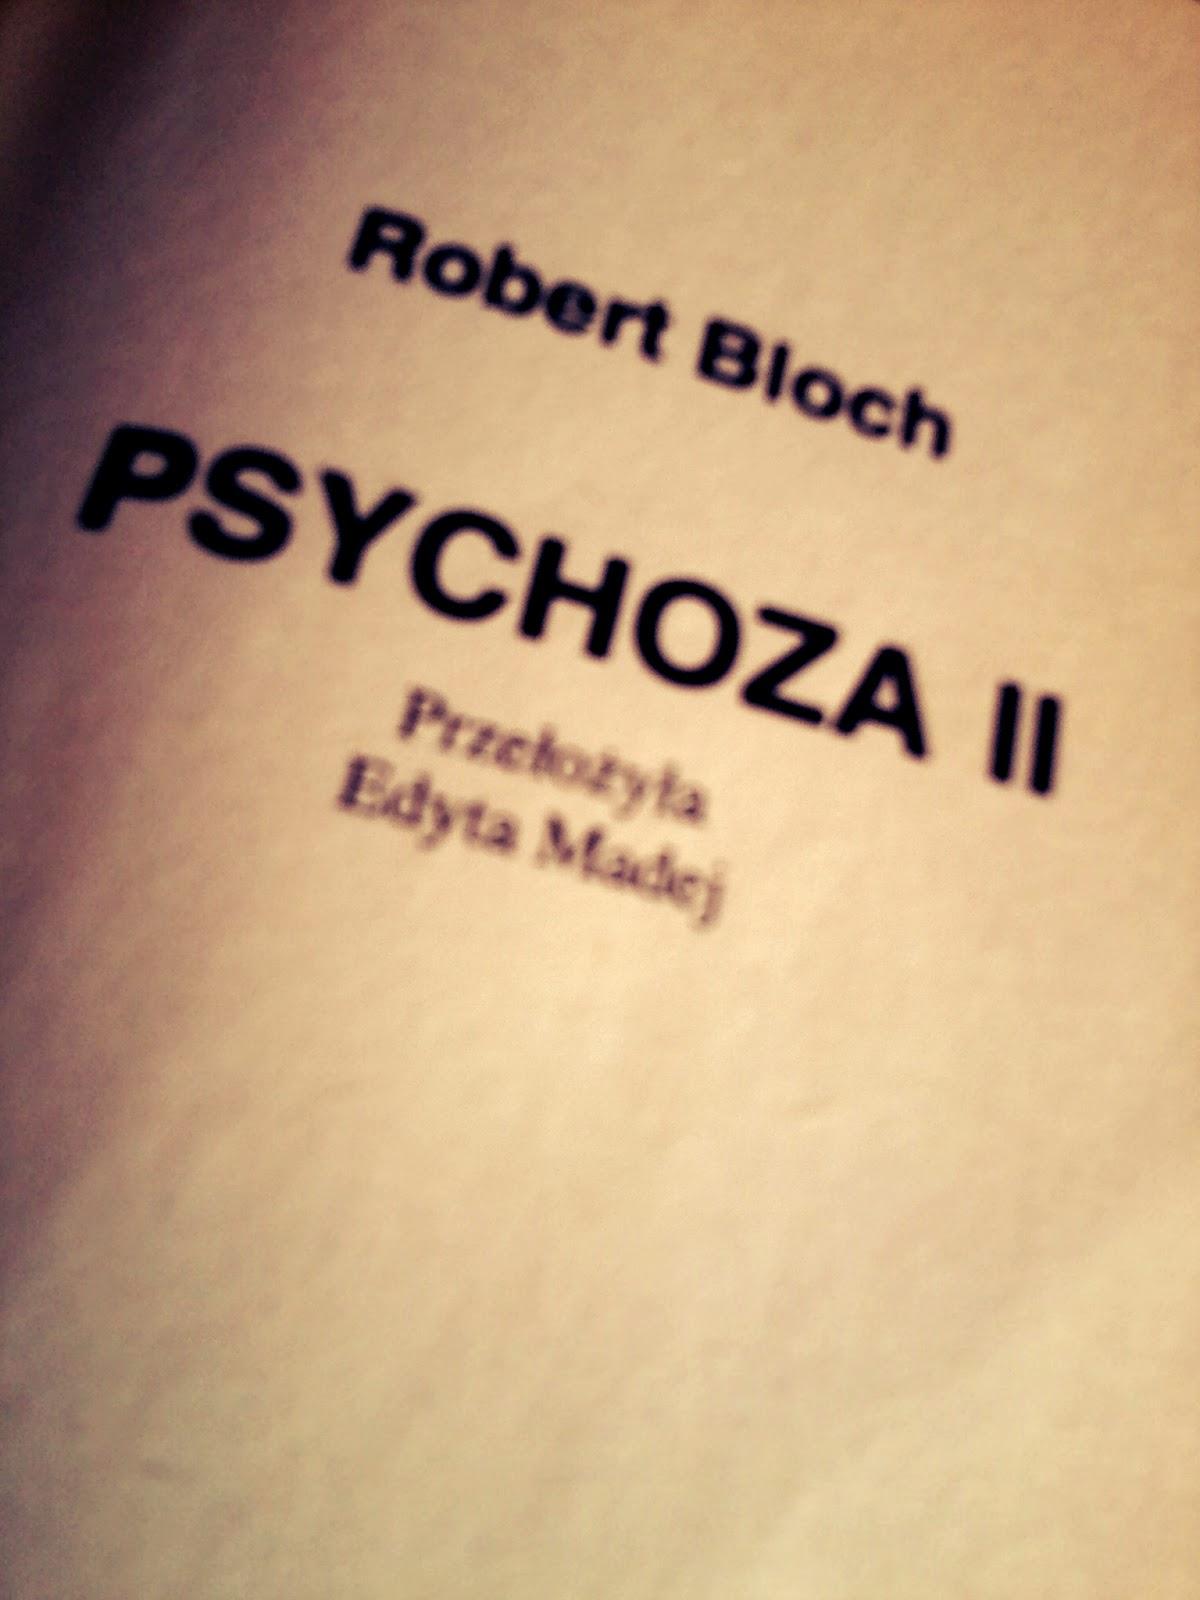 "Robert Bloch ""Psychoza II"""